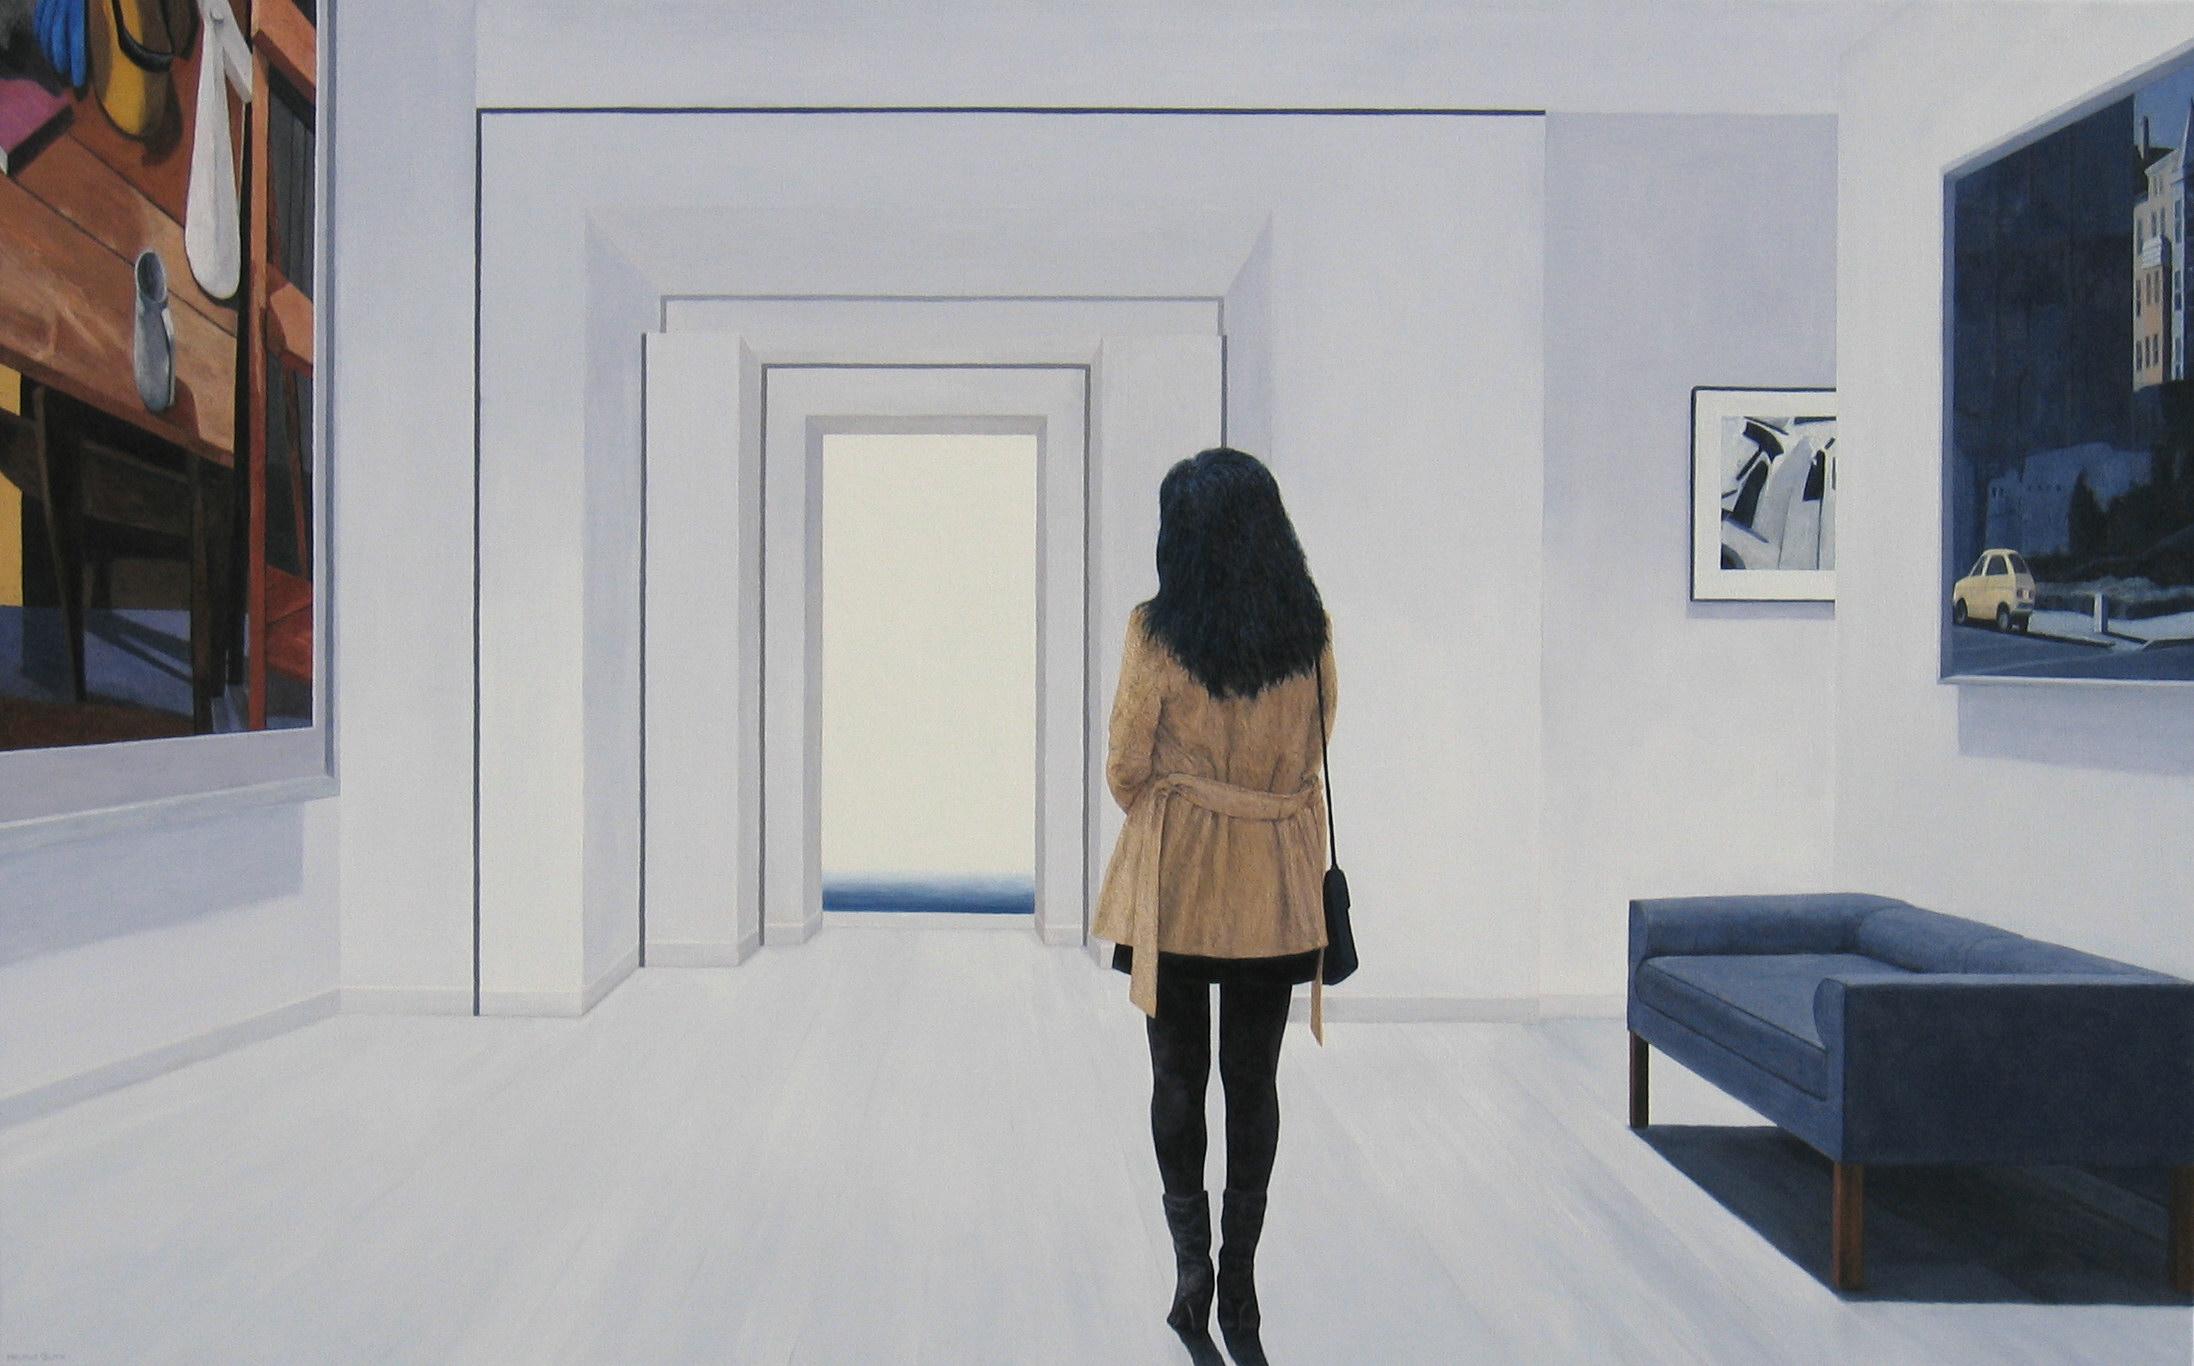 MUSEE, 2007, 114x182